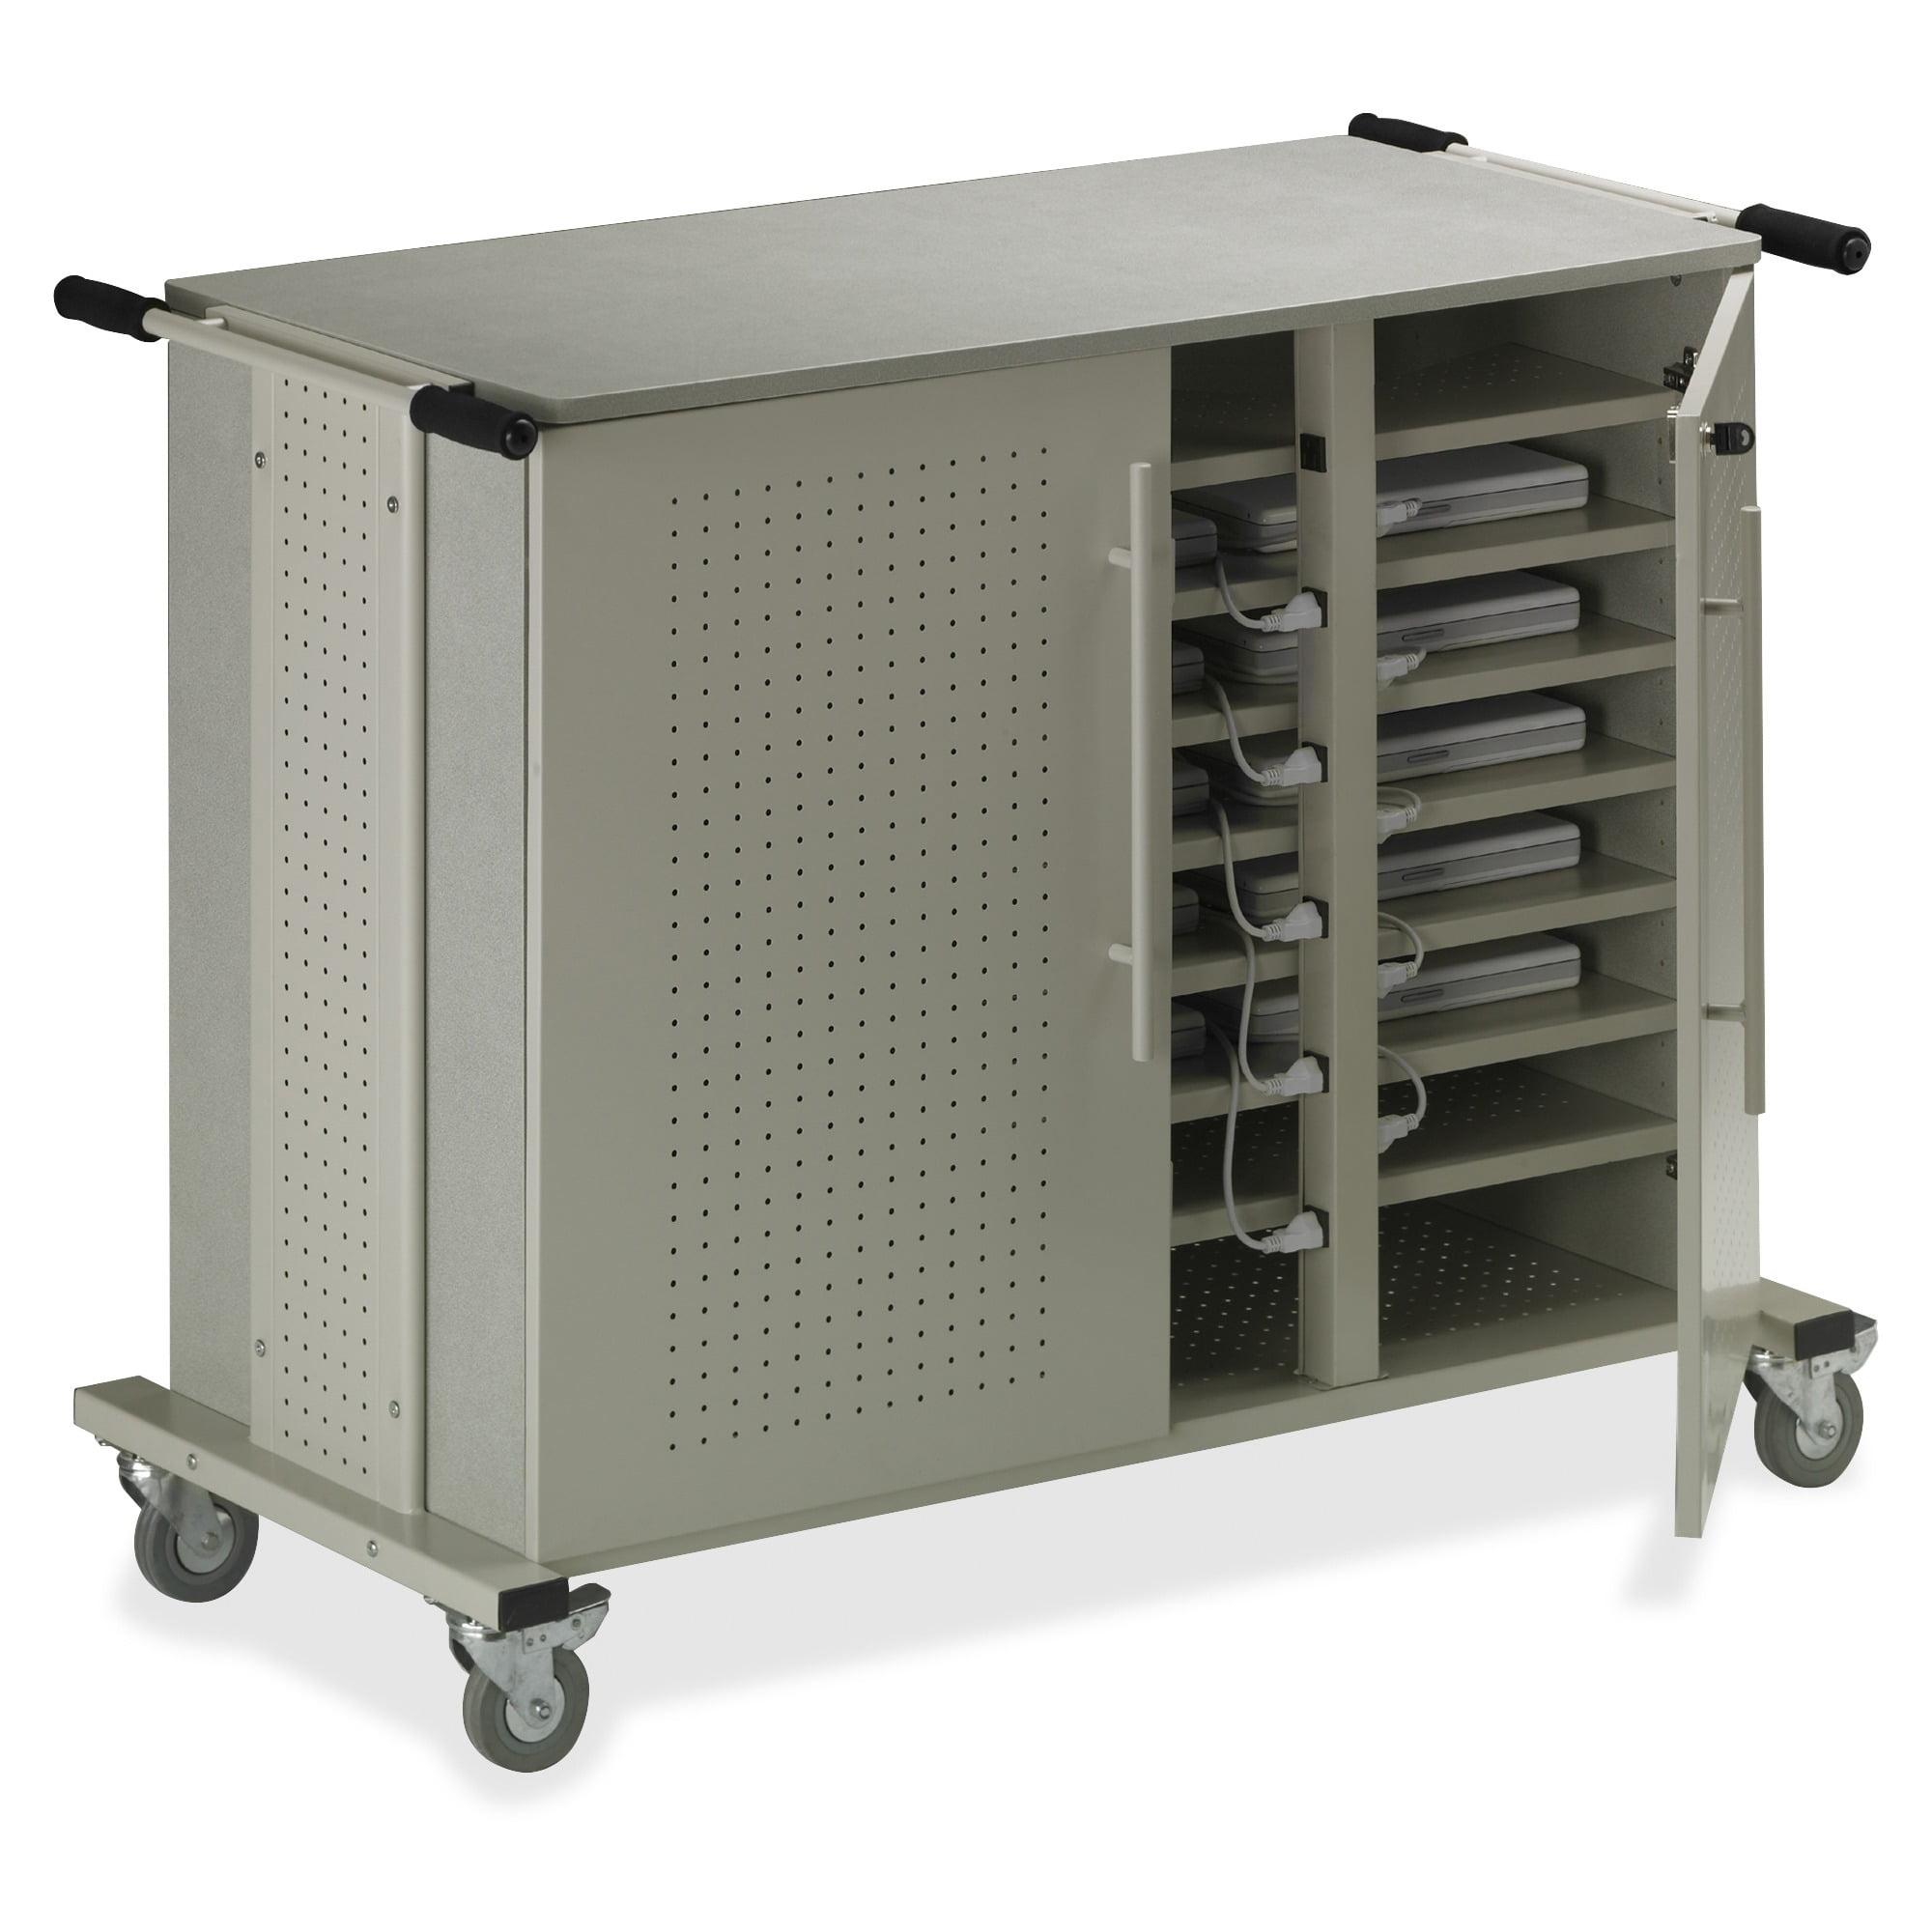 Mayline Laptop Cart, 50-1/2w x 26-1/2d x 40h, Gray Matrix/Sand